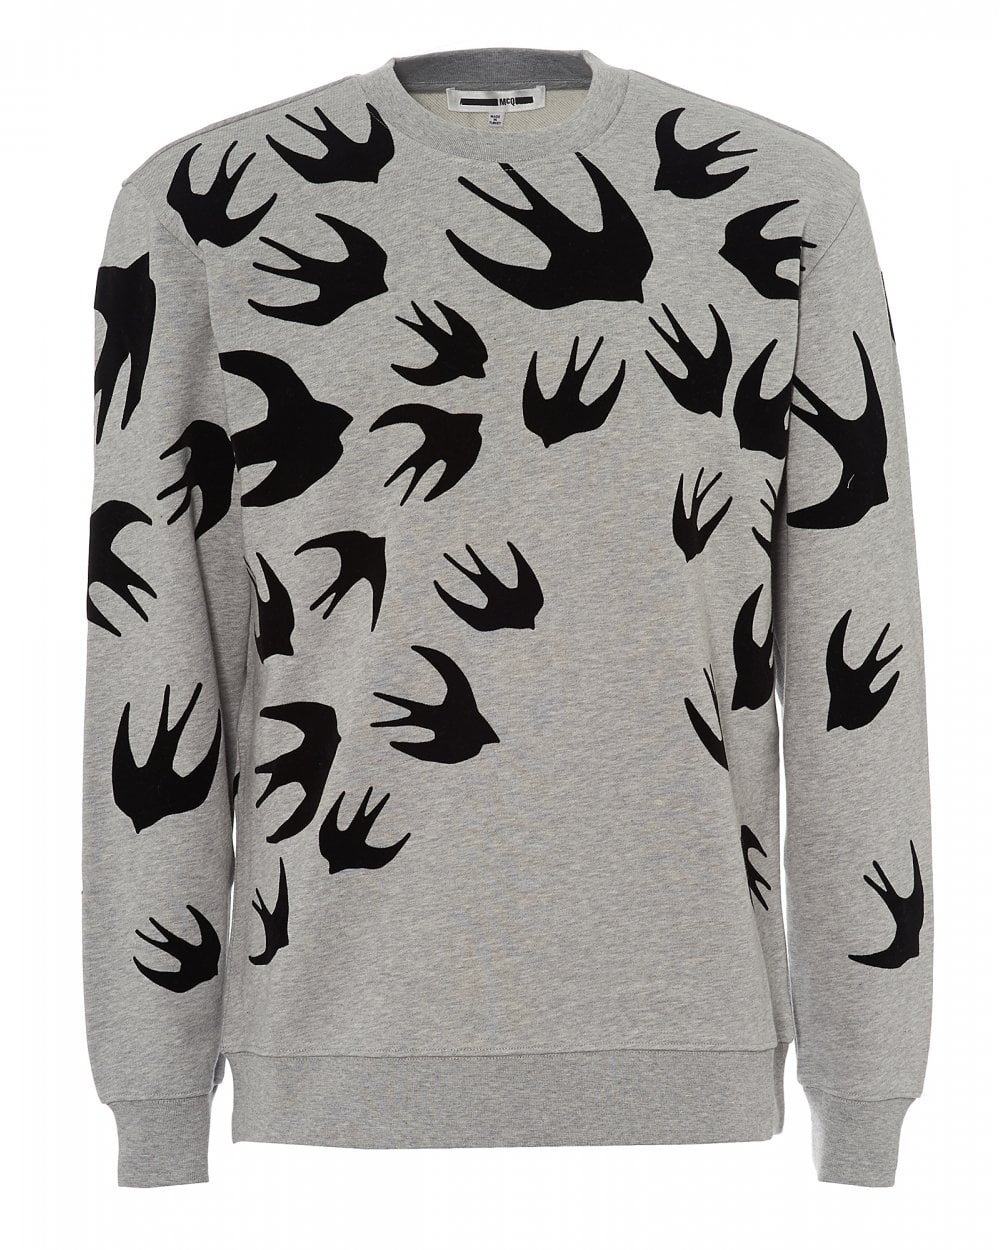 d5572065540 McQ by Alexander McQueen Mens All Over Swallows Grey Sweatshirt